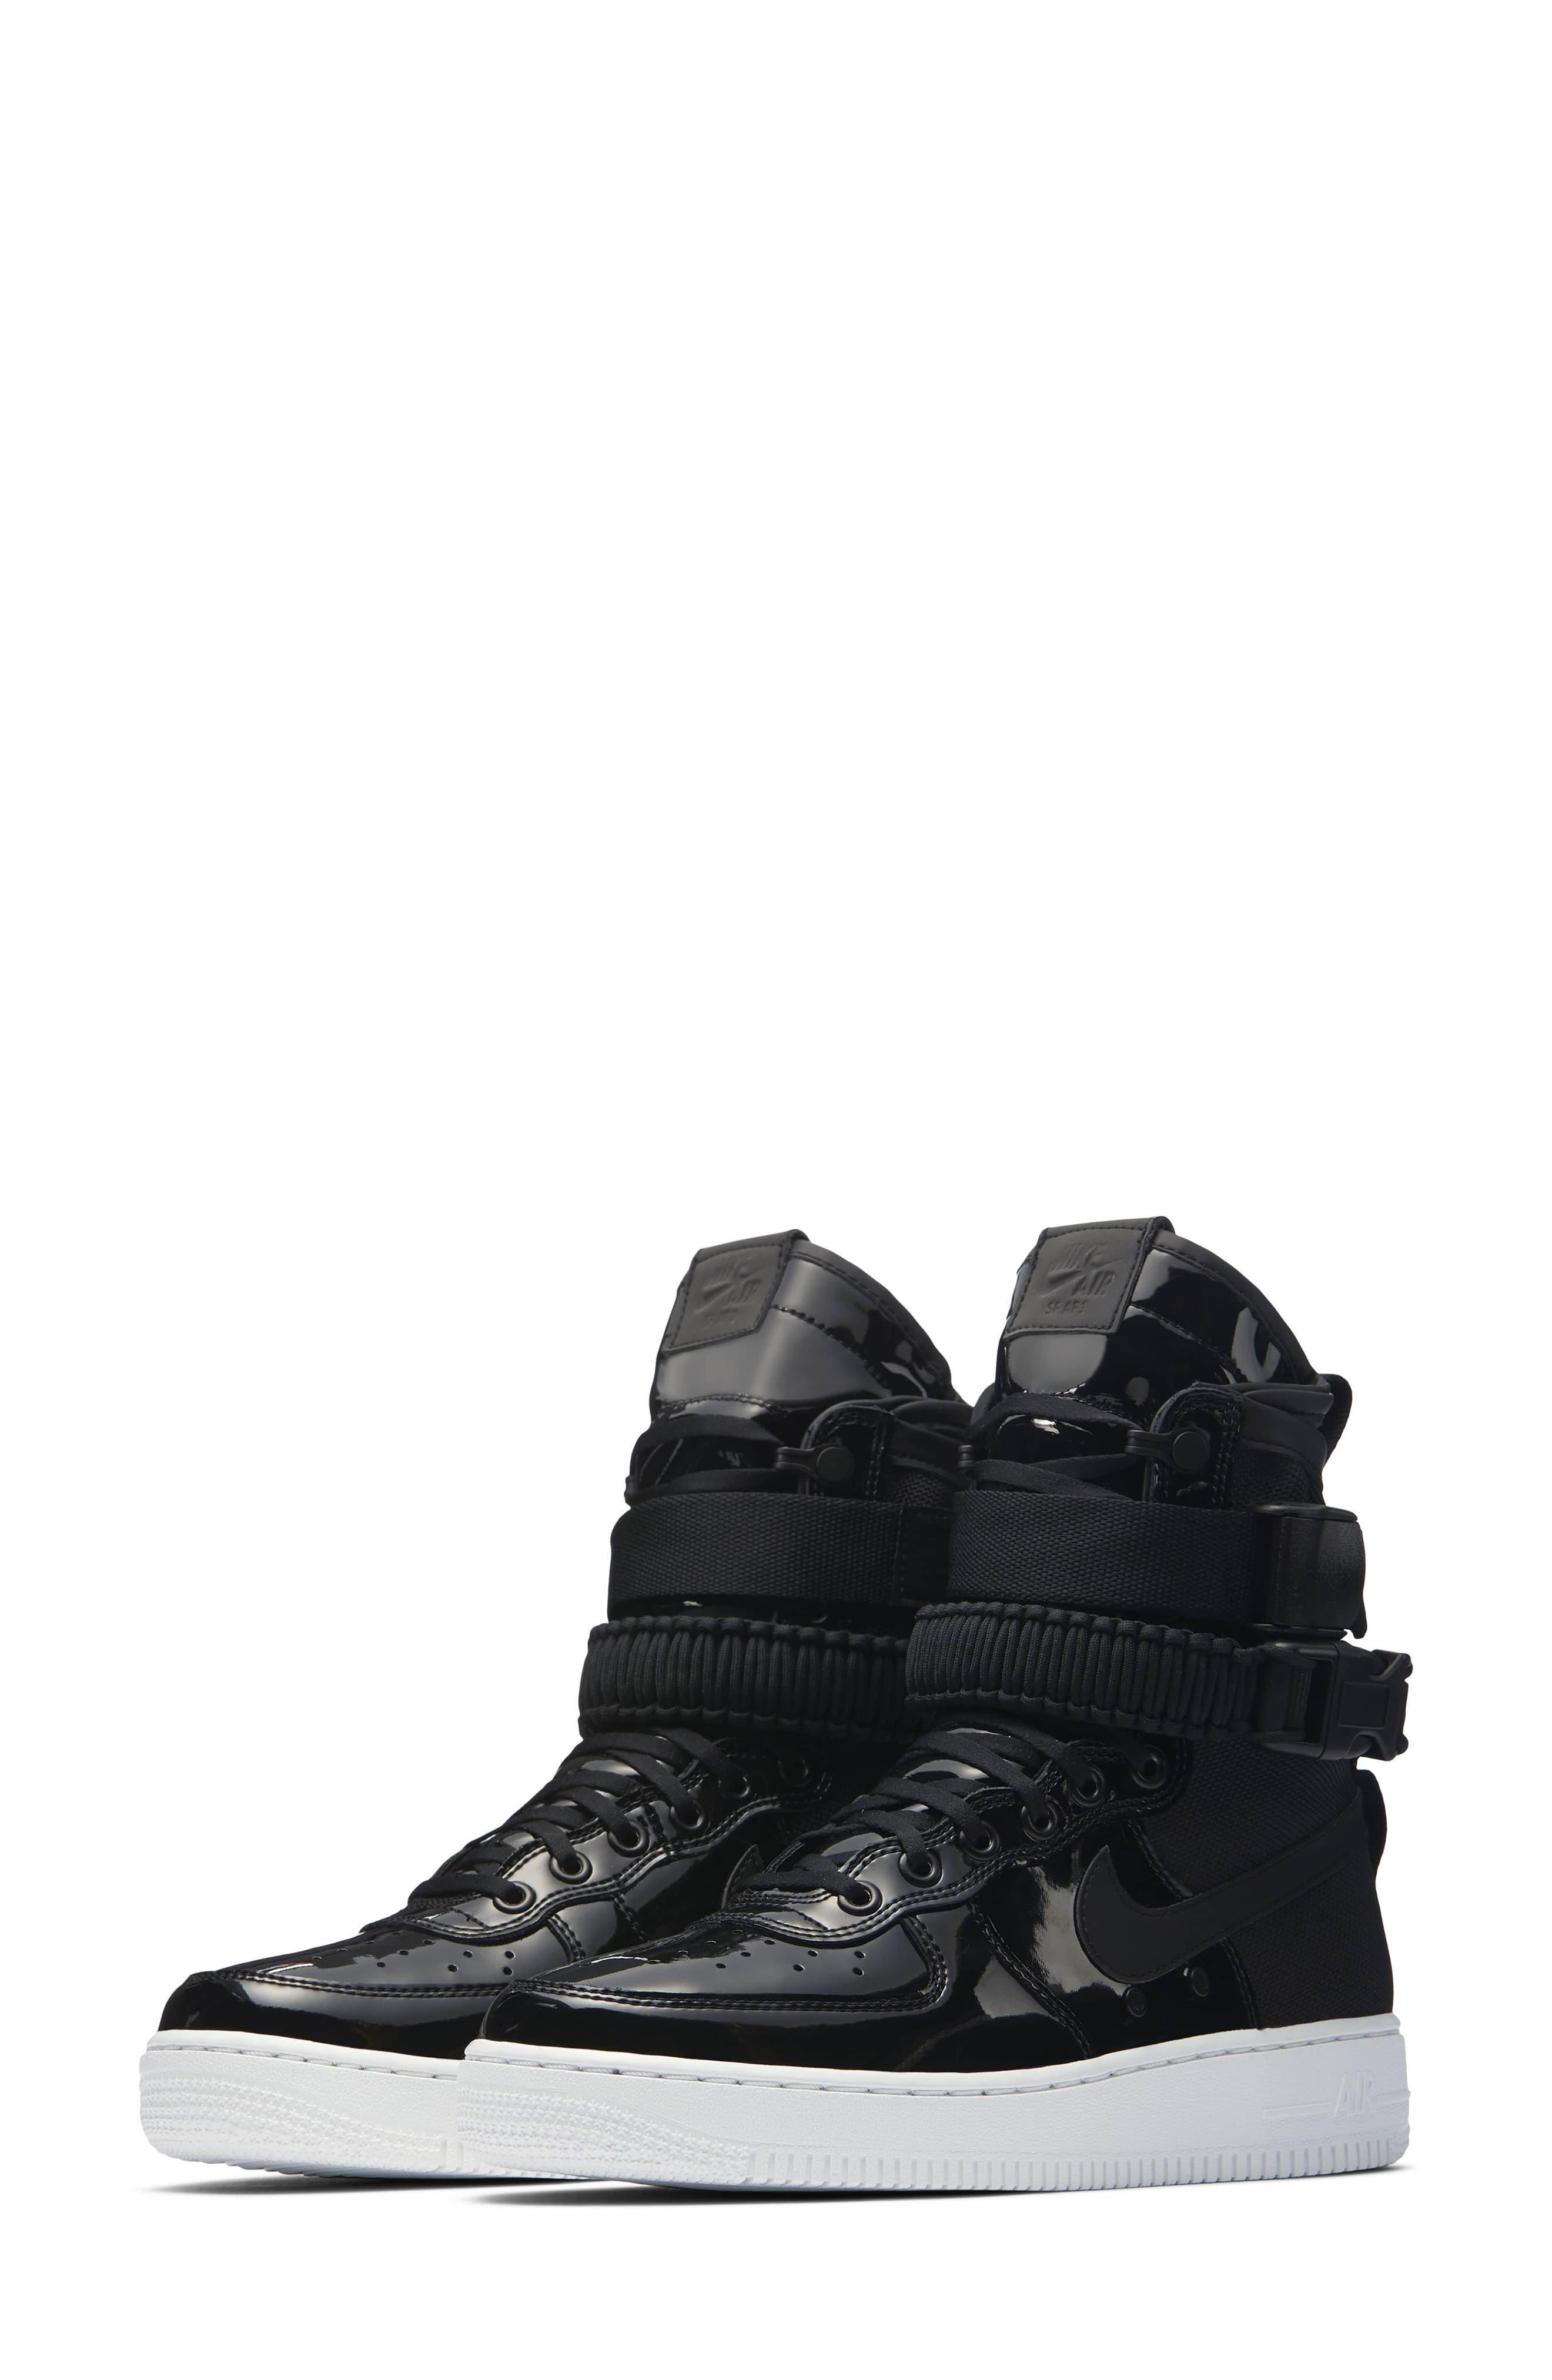 Main Image - Nike SF Air Force 1 High Top Sneaker (Women)